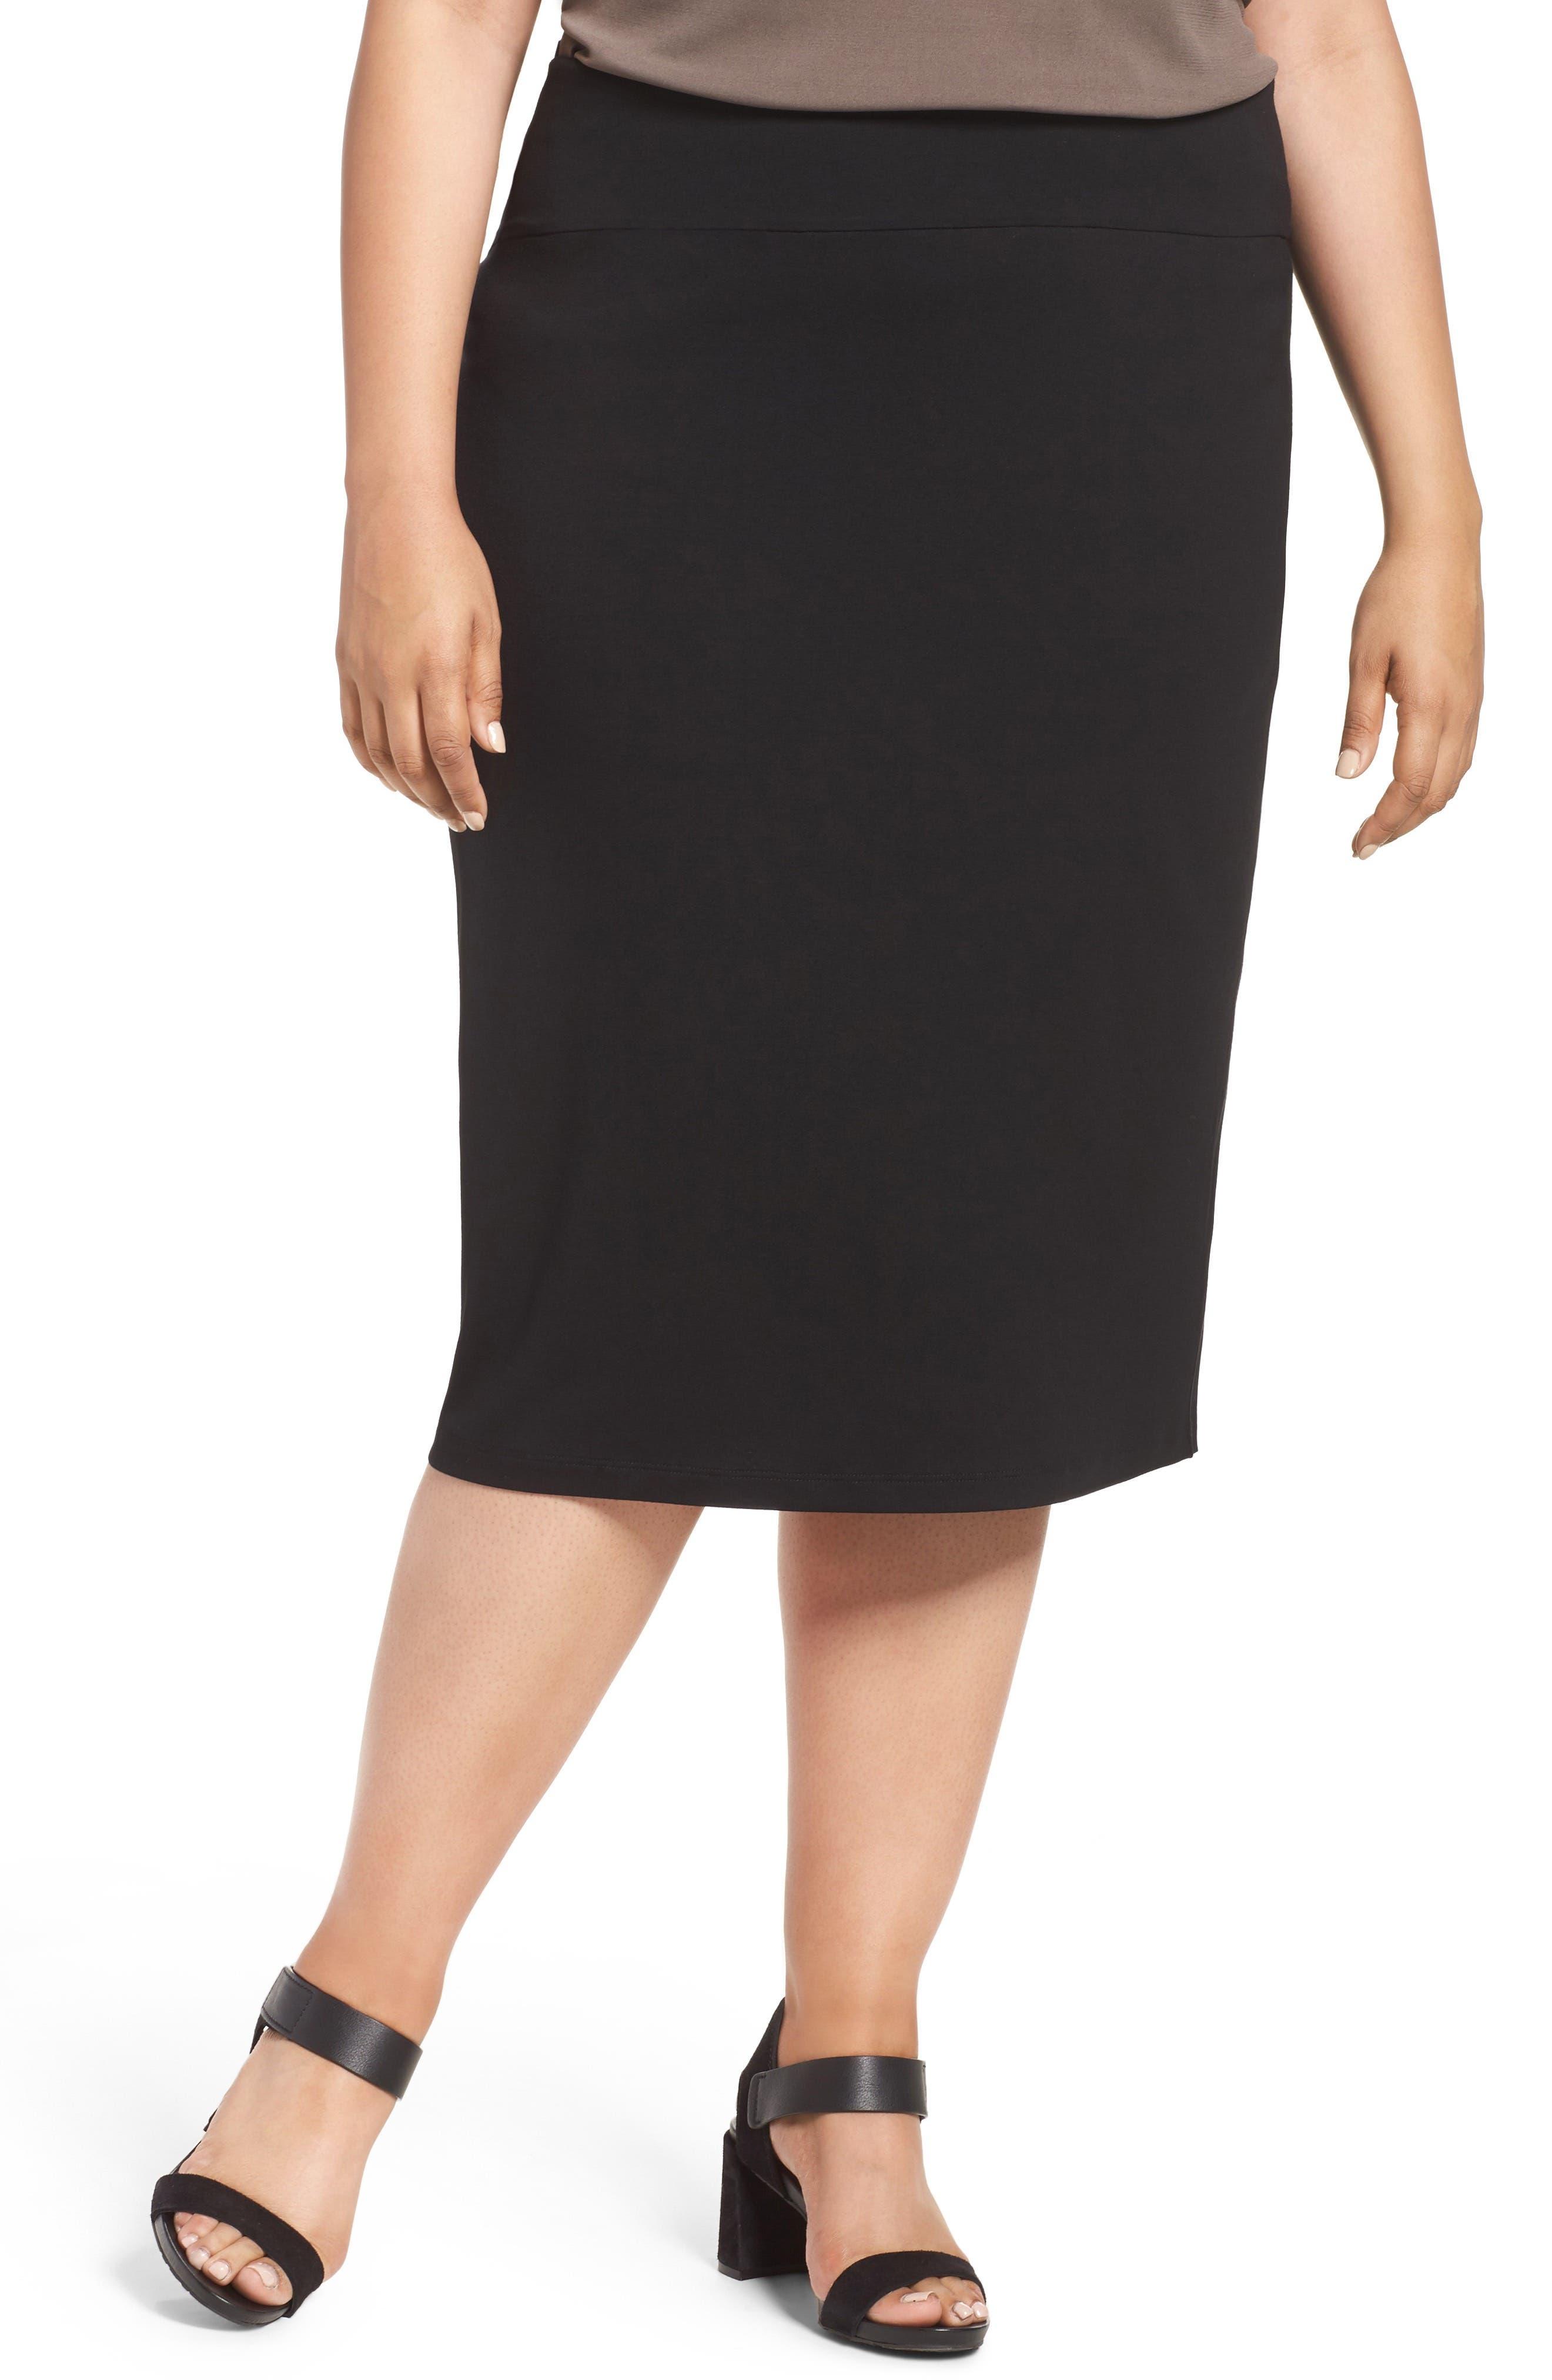 Eileen Fisher Foldover Waist Pencil Skirt (Plus Size)